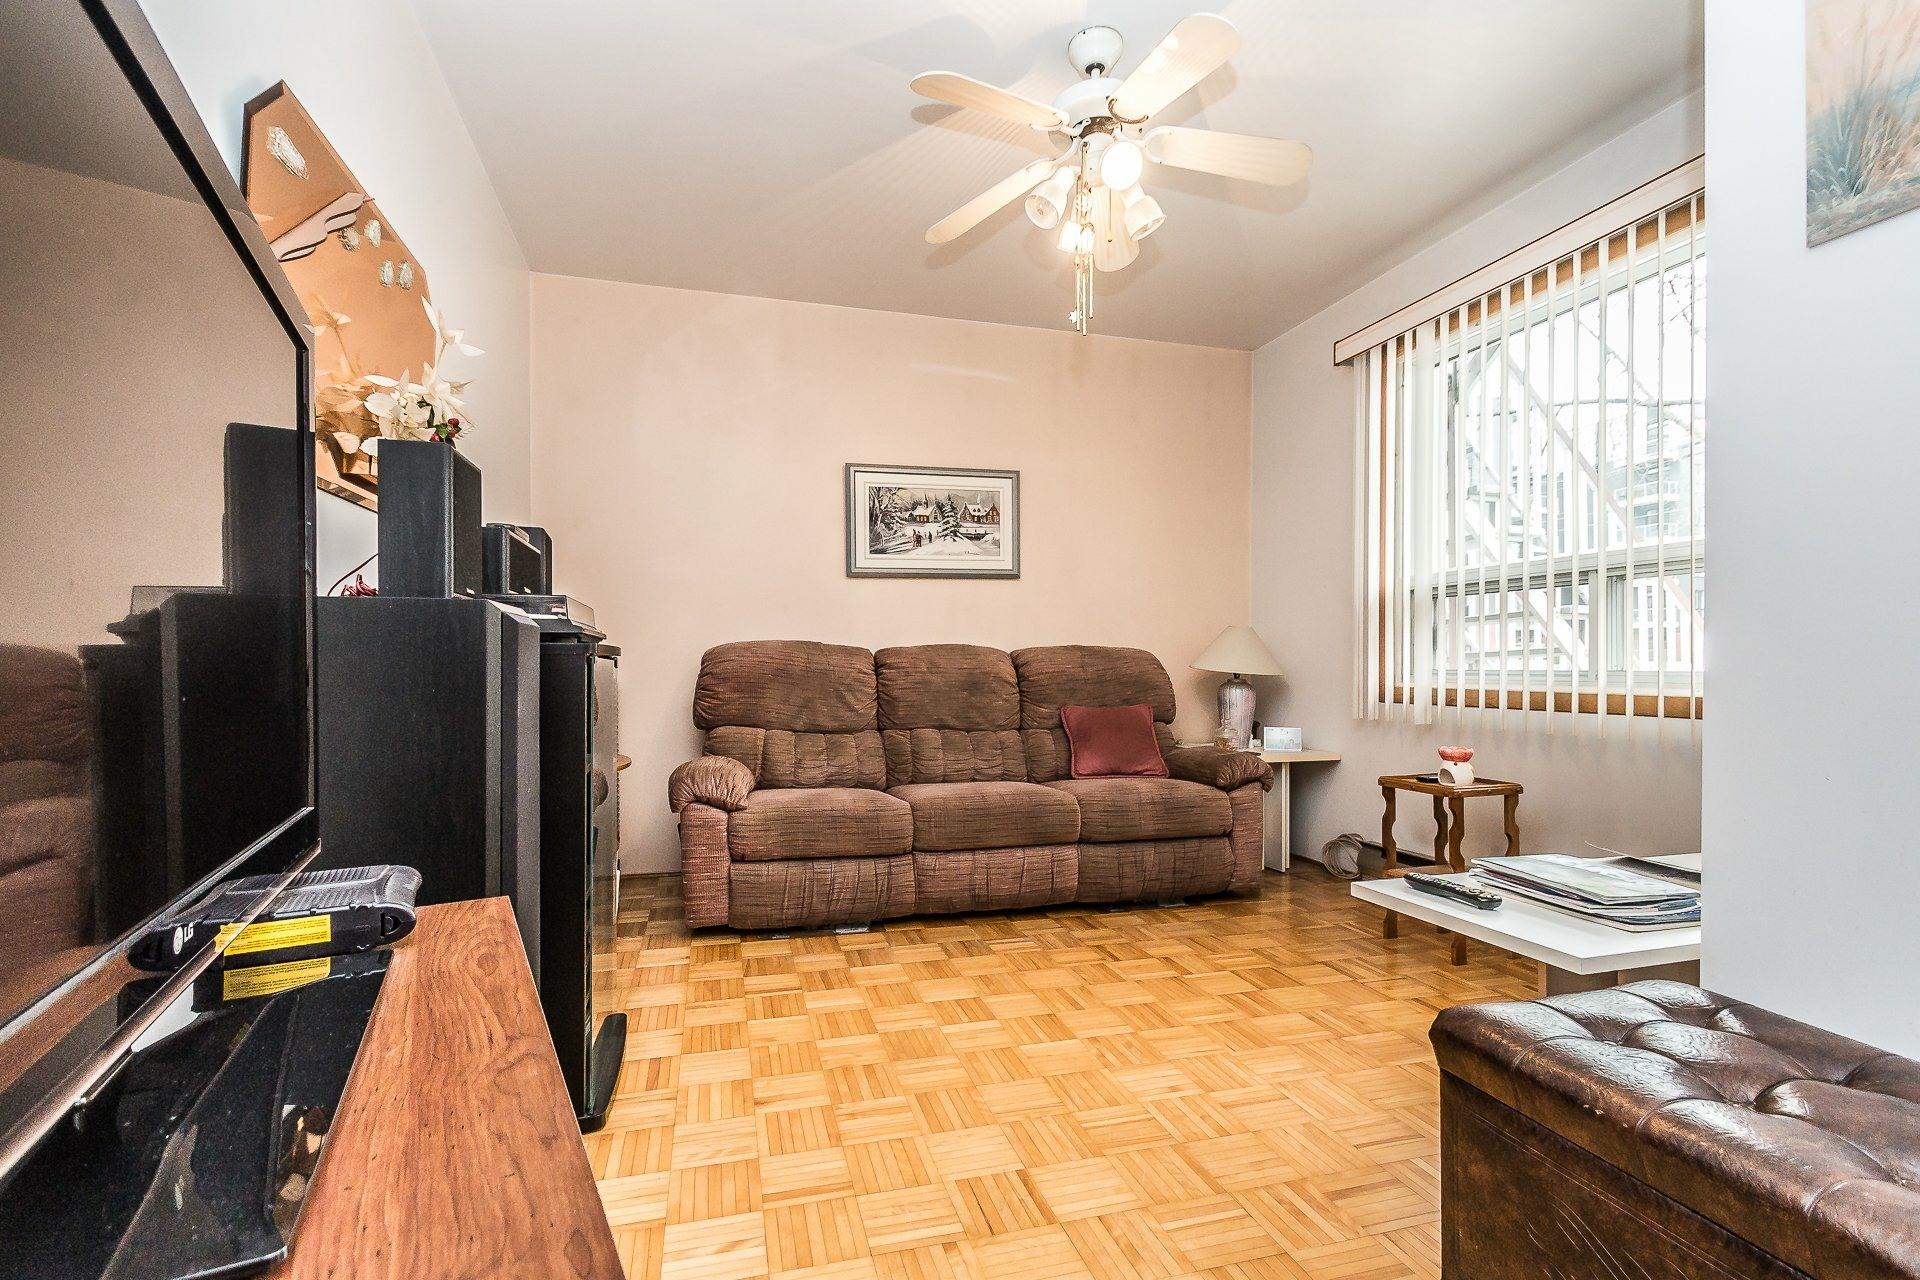 image 2 - Duplex En venta Montréal Lachine  - 3 habitaciones